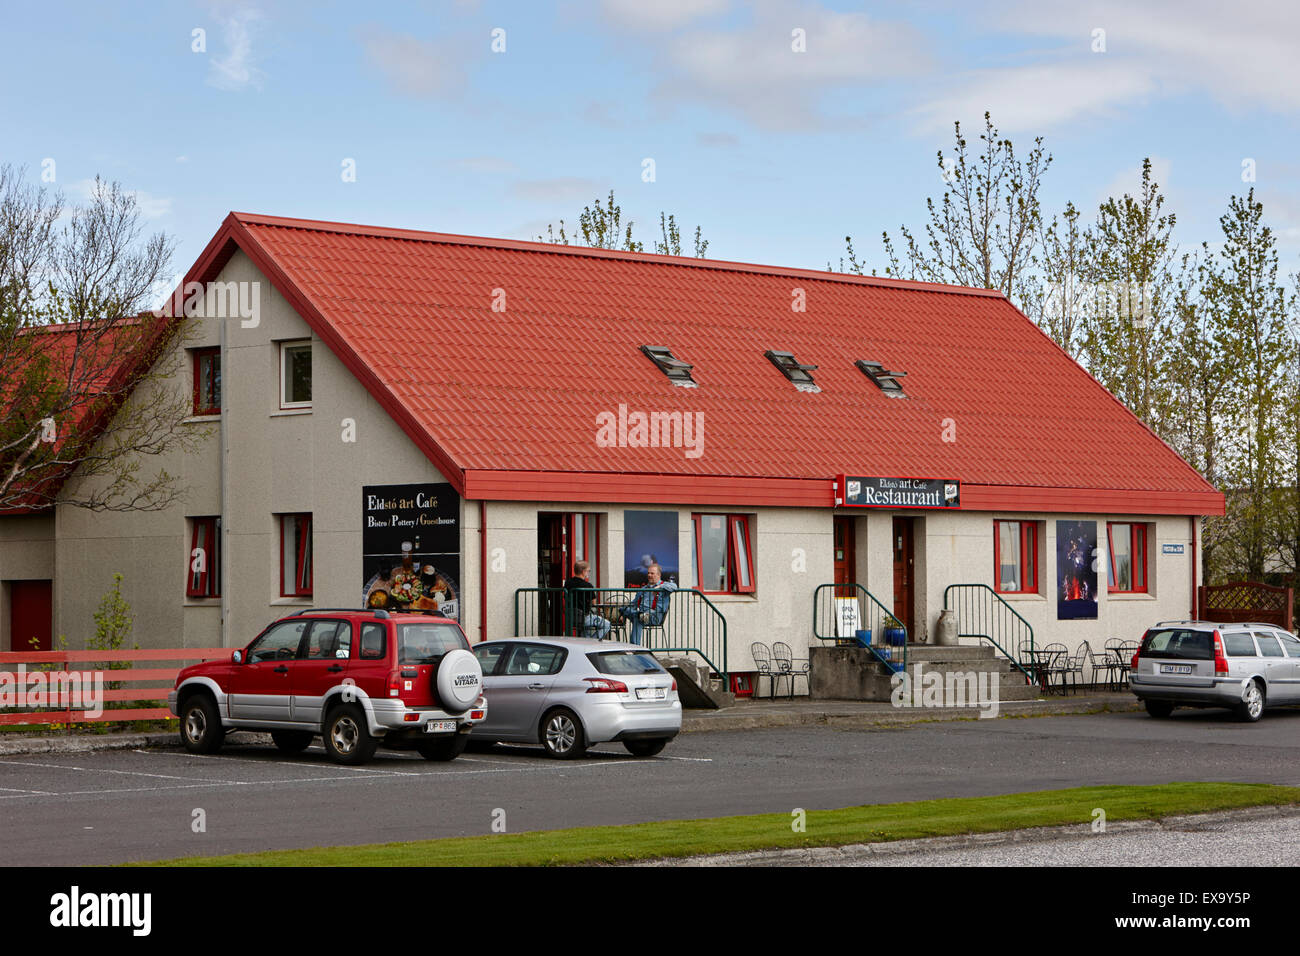 eldsto art cafe and bistro roadside restaurant on route 1 in hvolsvollur Iceland - Stock Image